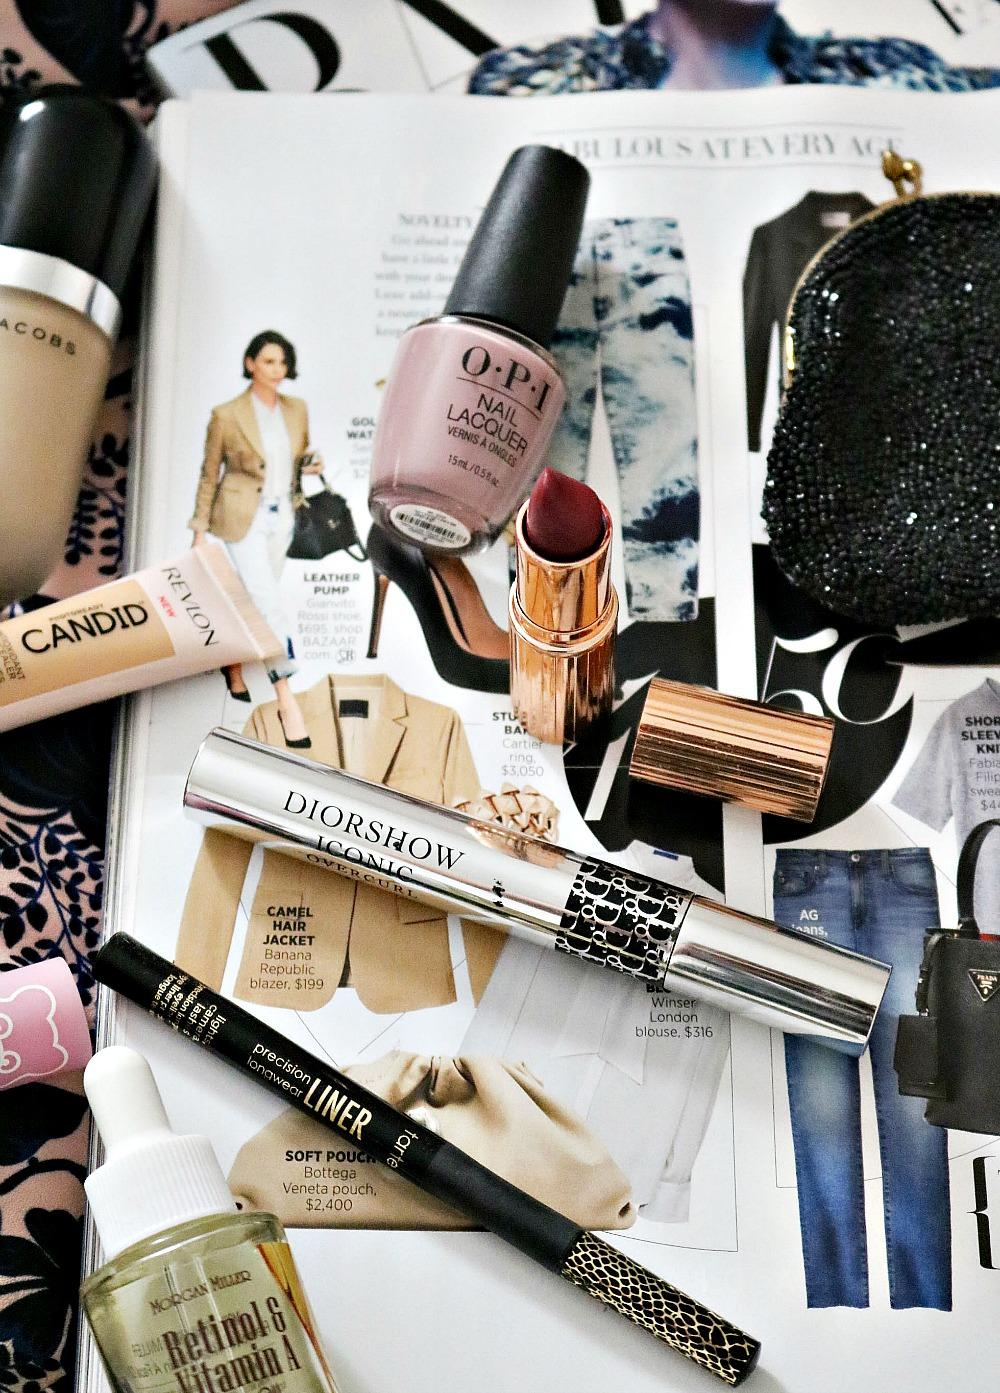 Early Fall Beauty Favorites I Marc Jacobs Beauty, Charlotte Tilbury Lipstick and Dior Mascara #Makeup #Makeupblog #beautyblog #makeuplove